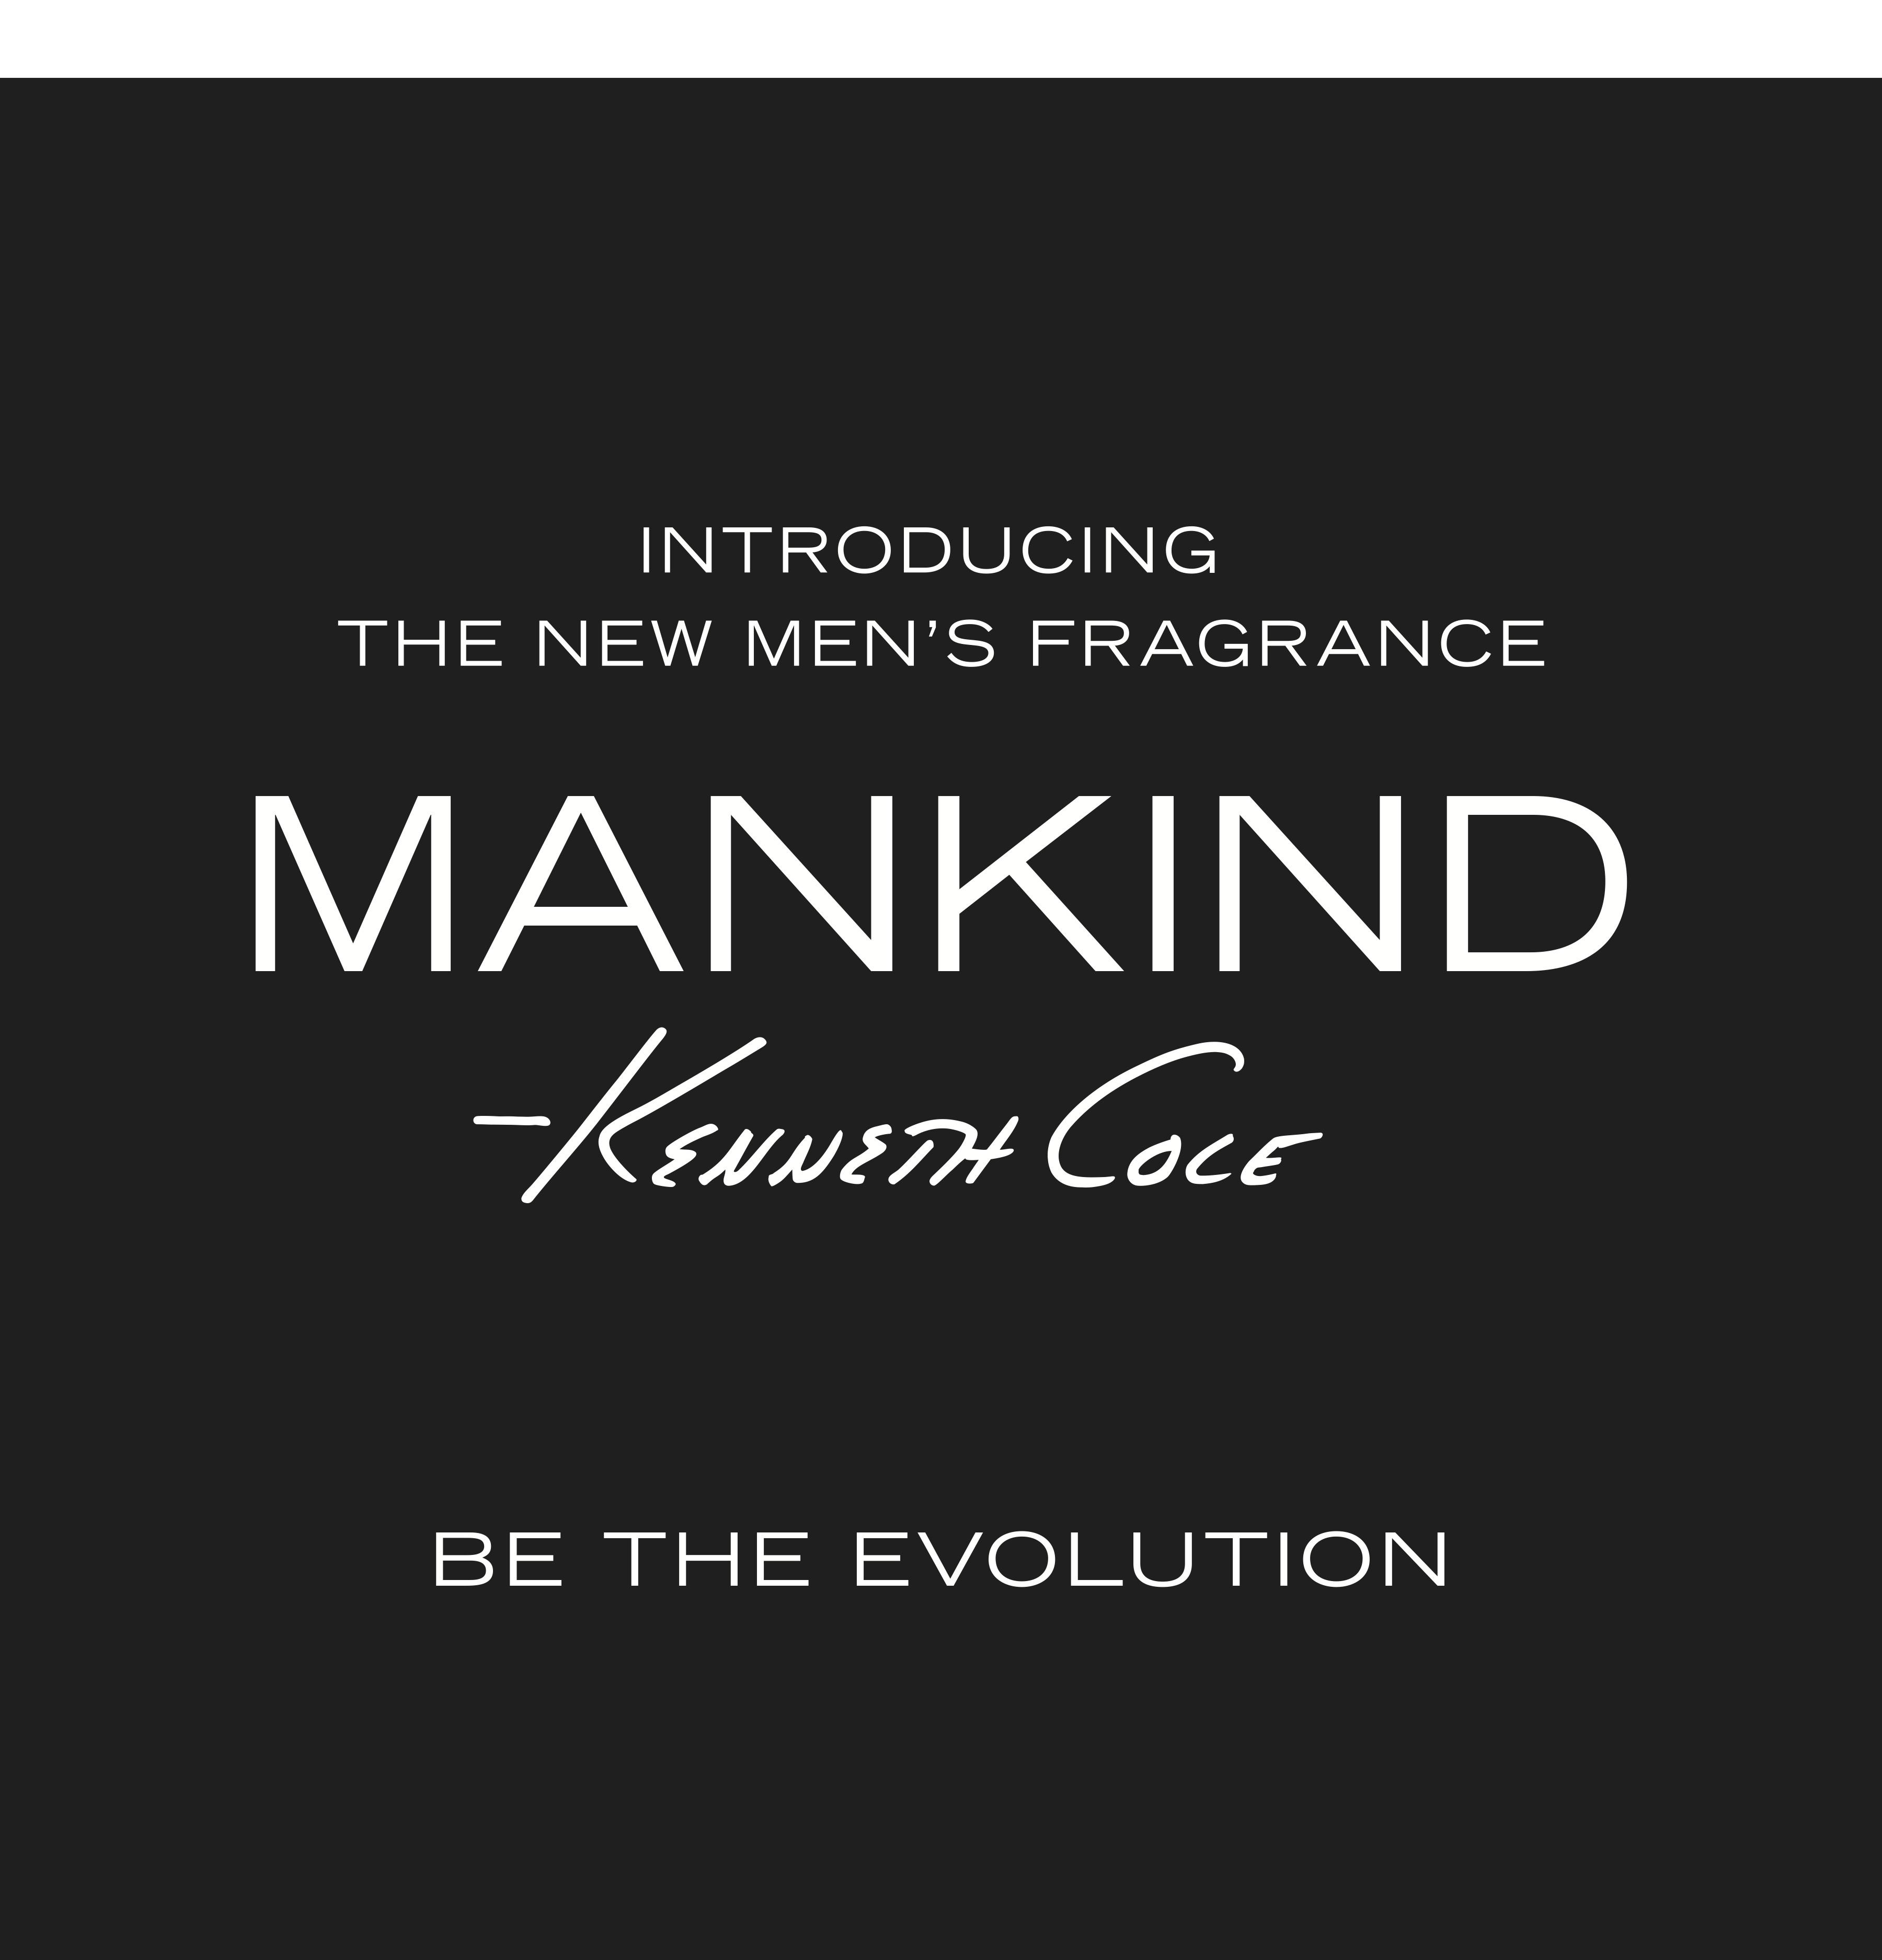 mankind copy.jpg